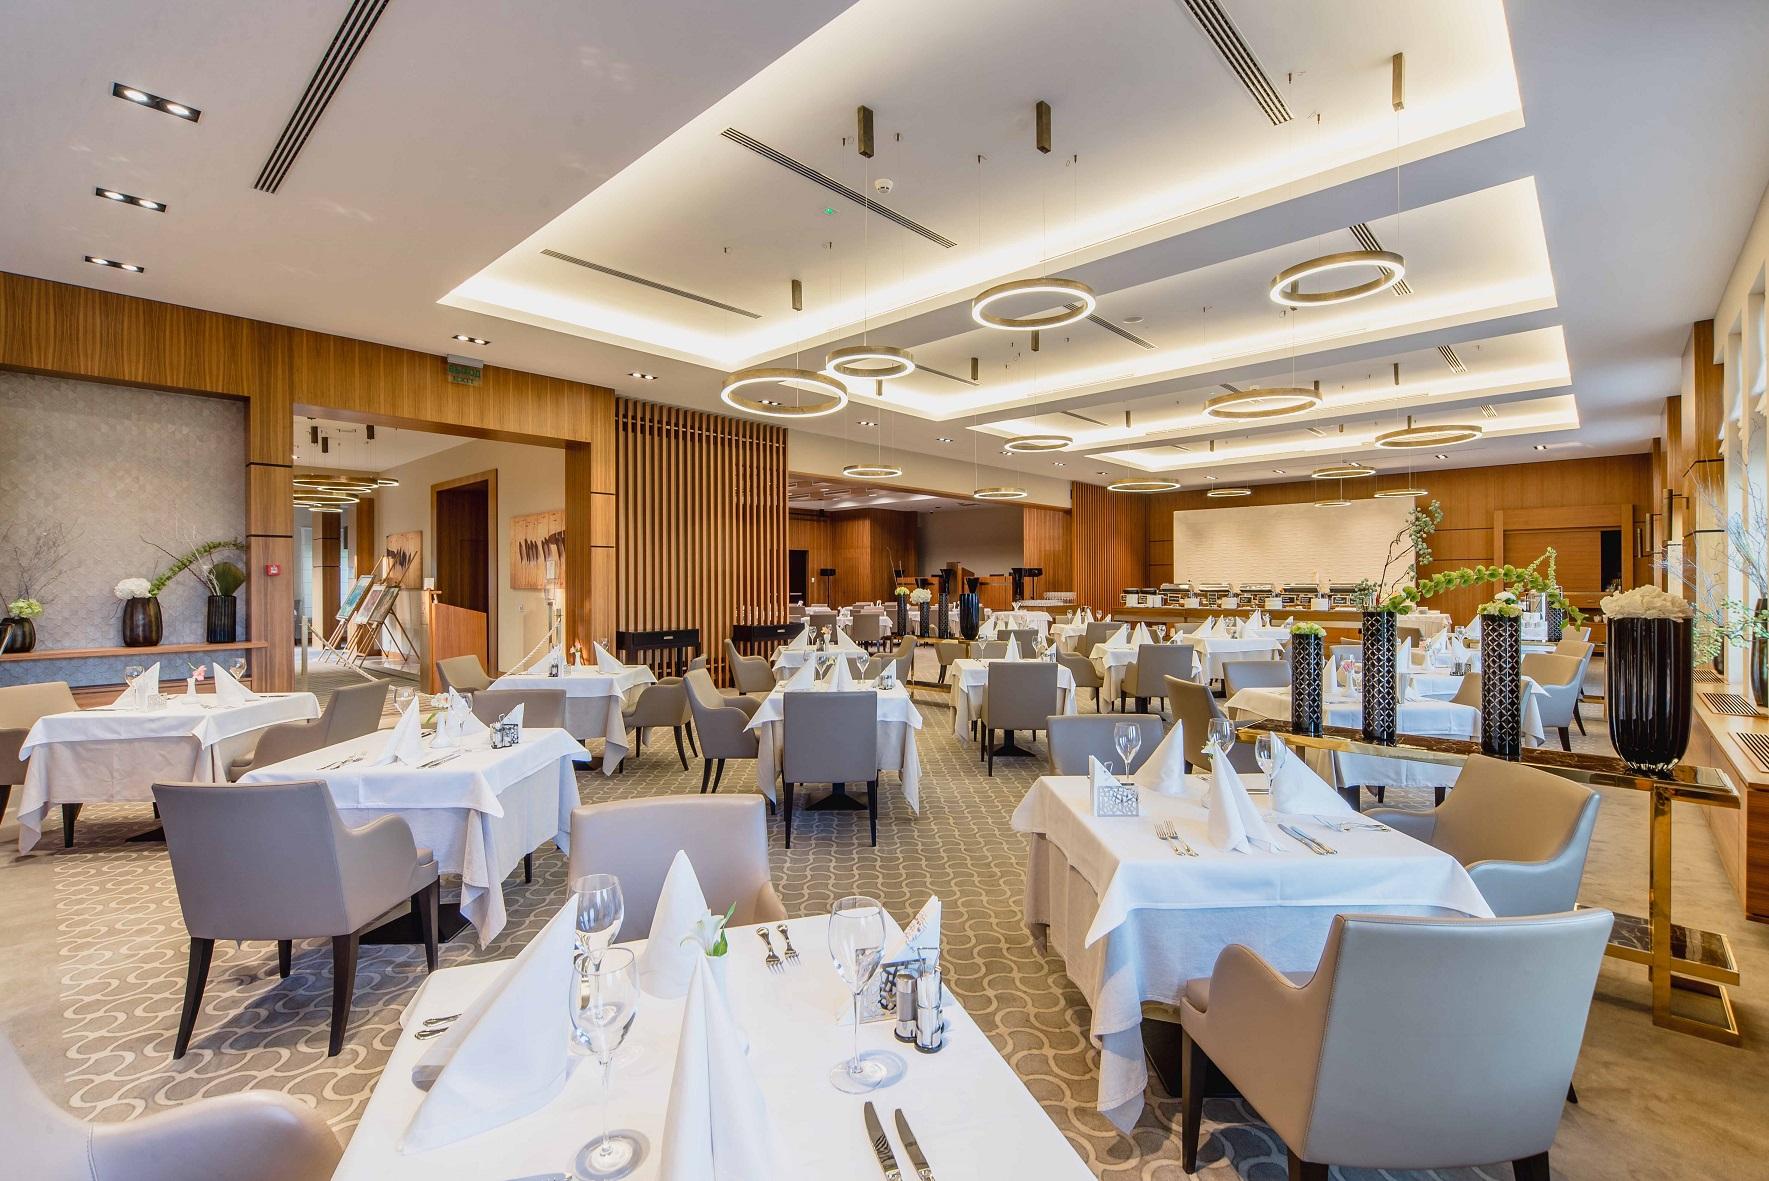 9 Ресторан Melodia + Конференц-зал Sonata